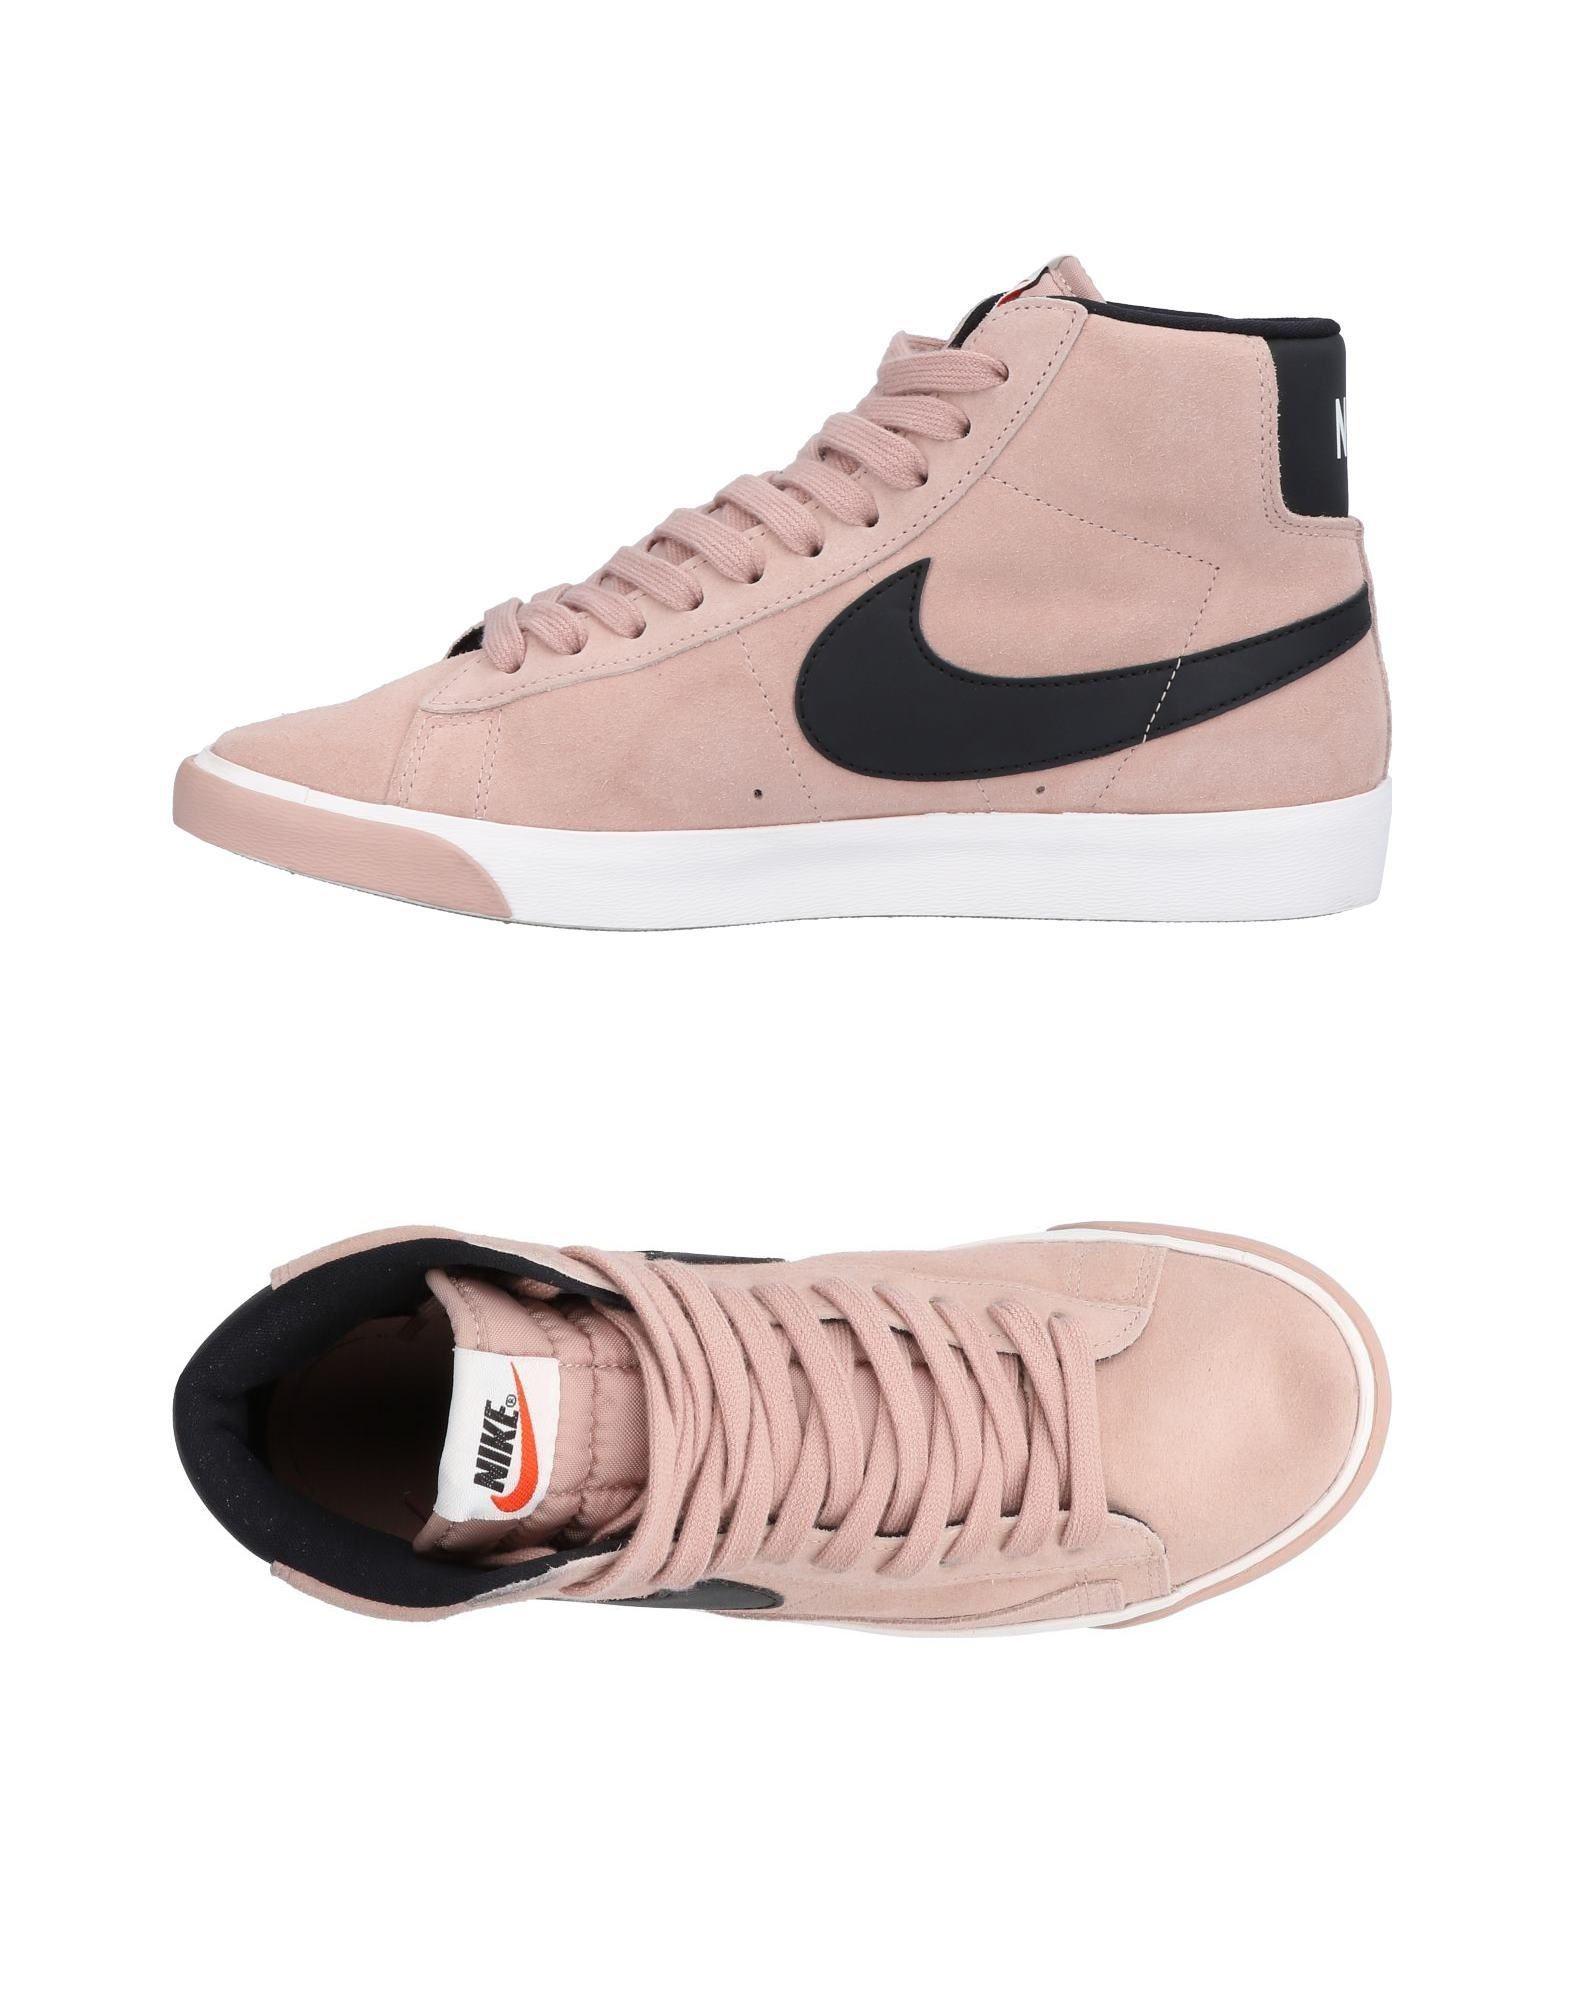 Lyst - Nike High-tops   Sneakers in Pink 103fe5992